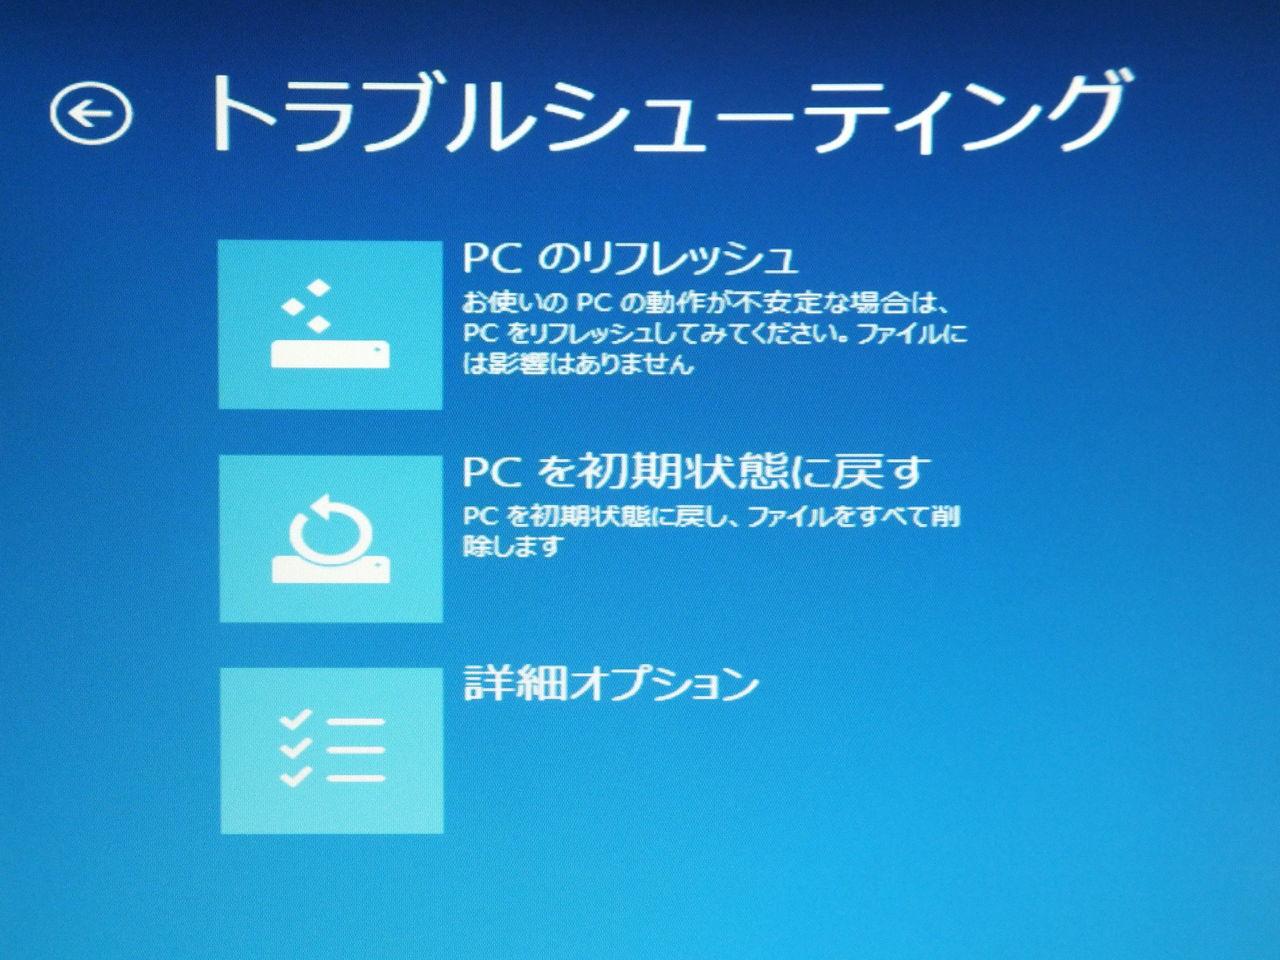 Windows 8プチテクニック 万一のために「回復ドライブ」を作成する